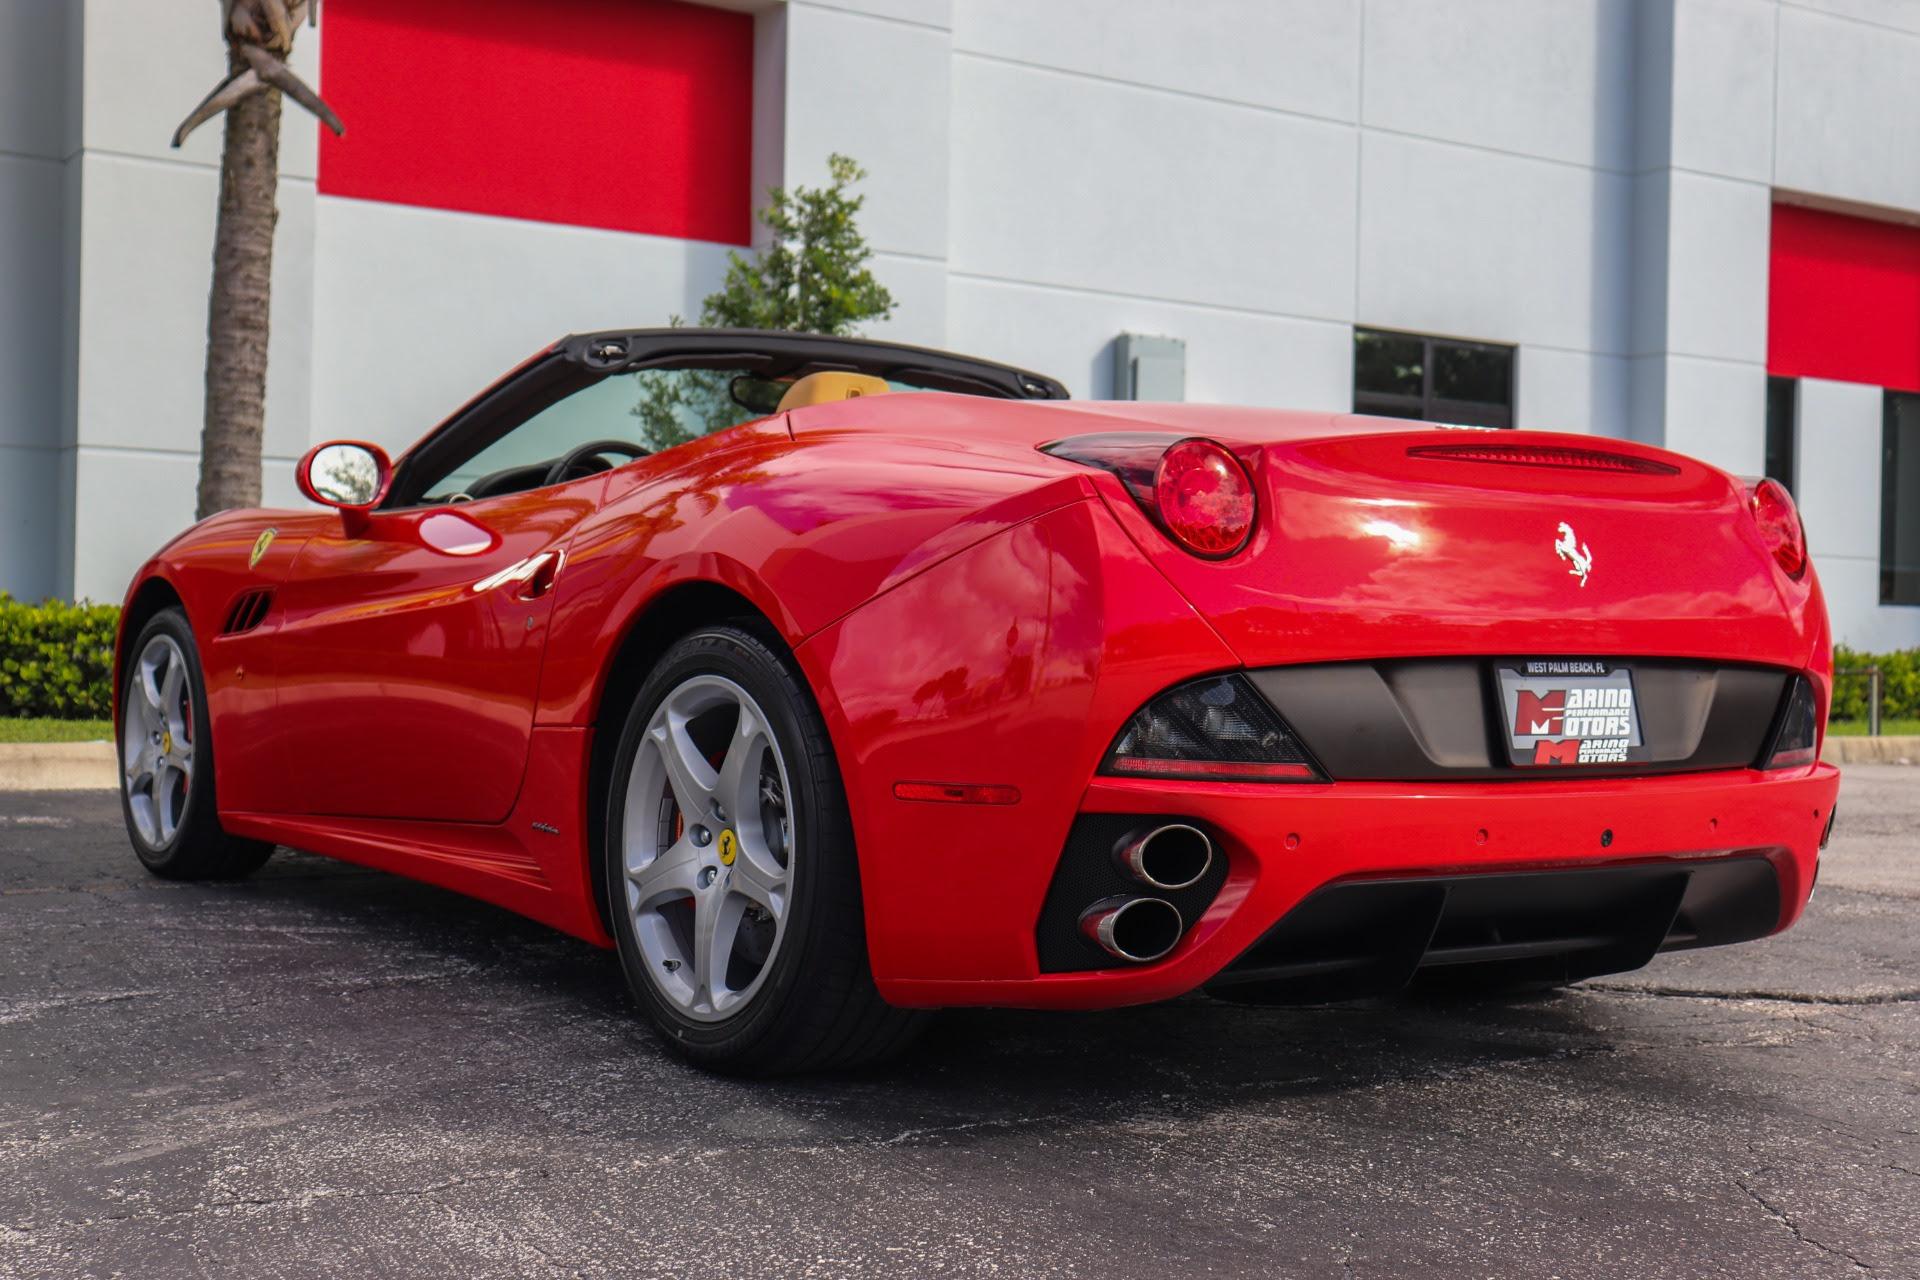 Used 2010 Ferrari California For Sale ($94,900) | Marino ...